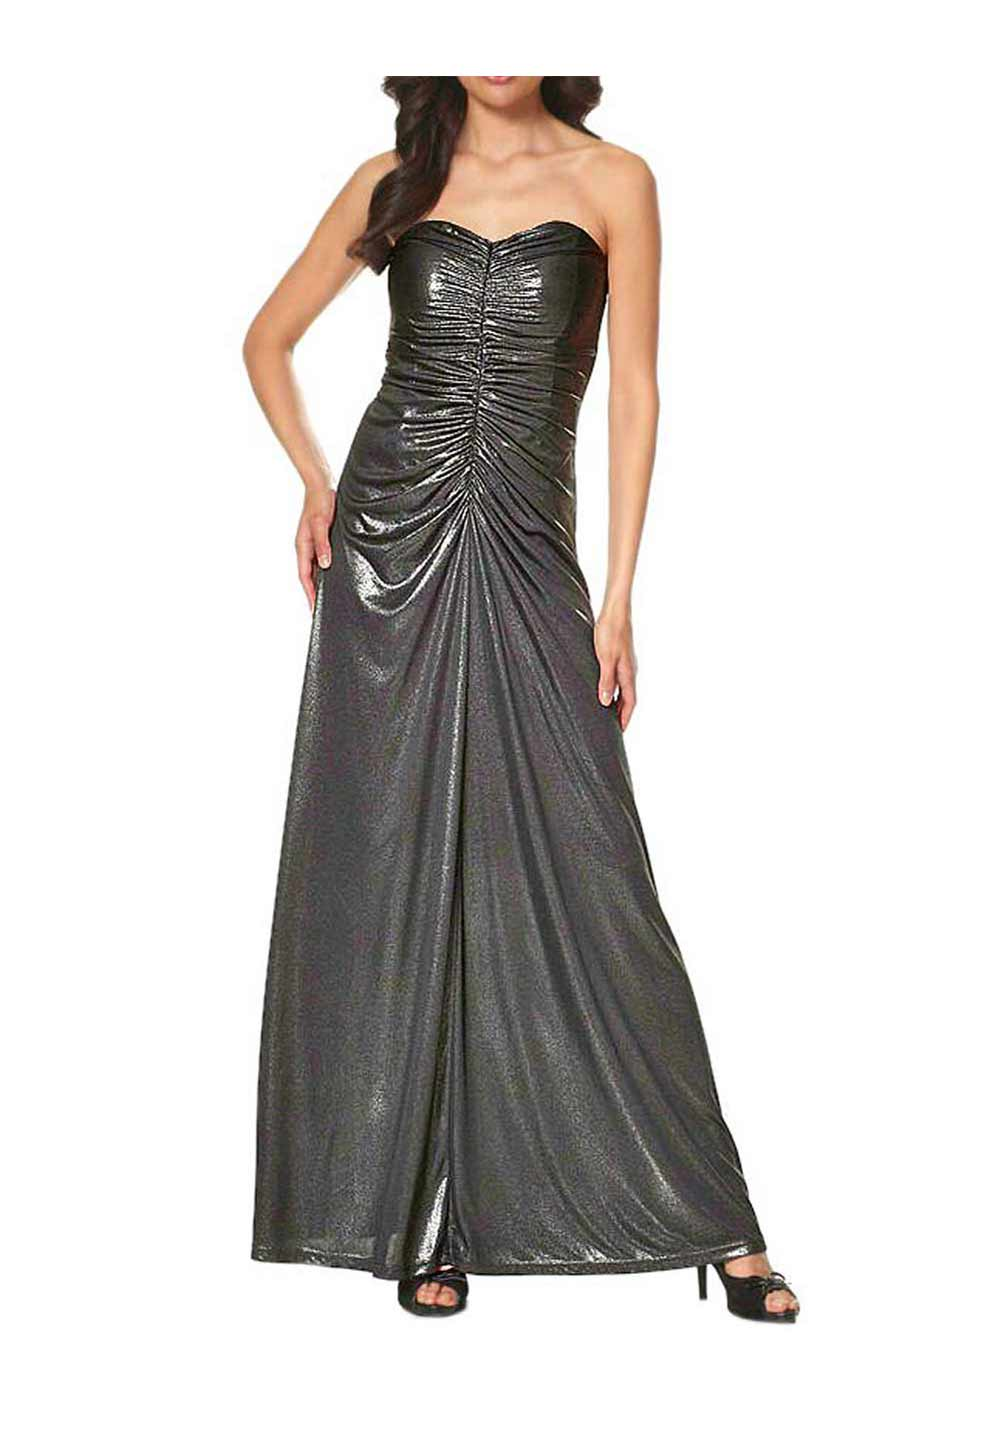 Festmoden Laura Scott Evening Abendkleid lang, schwarz-metallic 475.706 475.706 Missforty